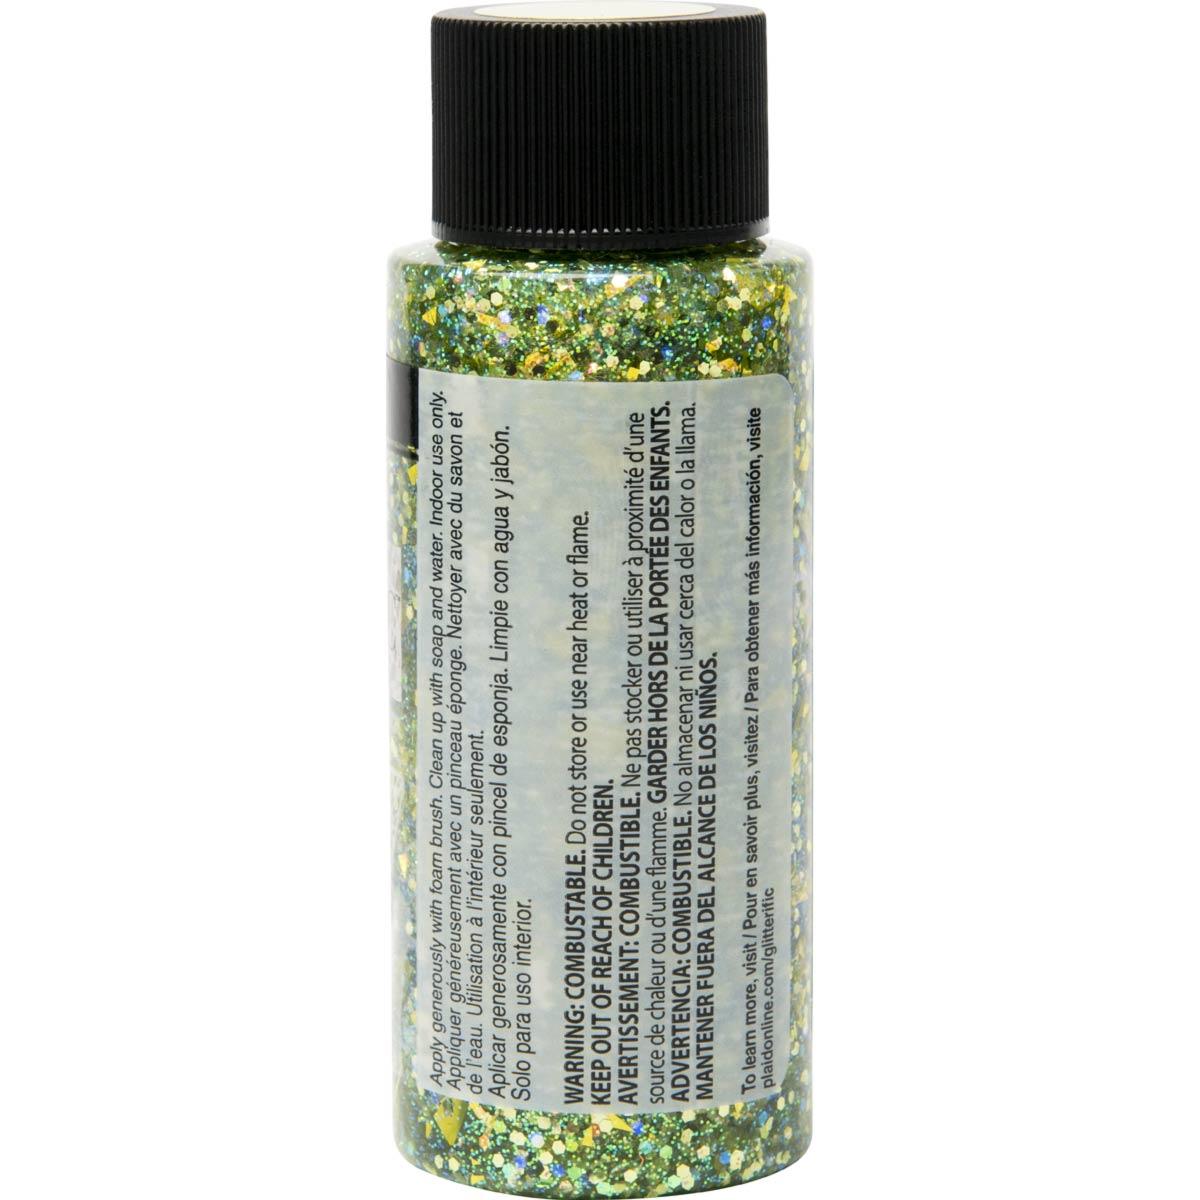 FolkArt ® Glitterific™ Acrylic Paint - Green, 2 oz.